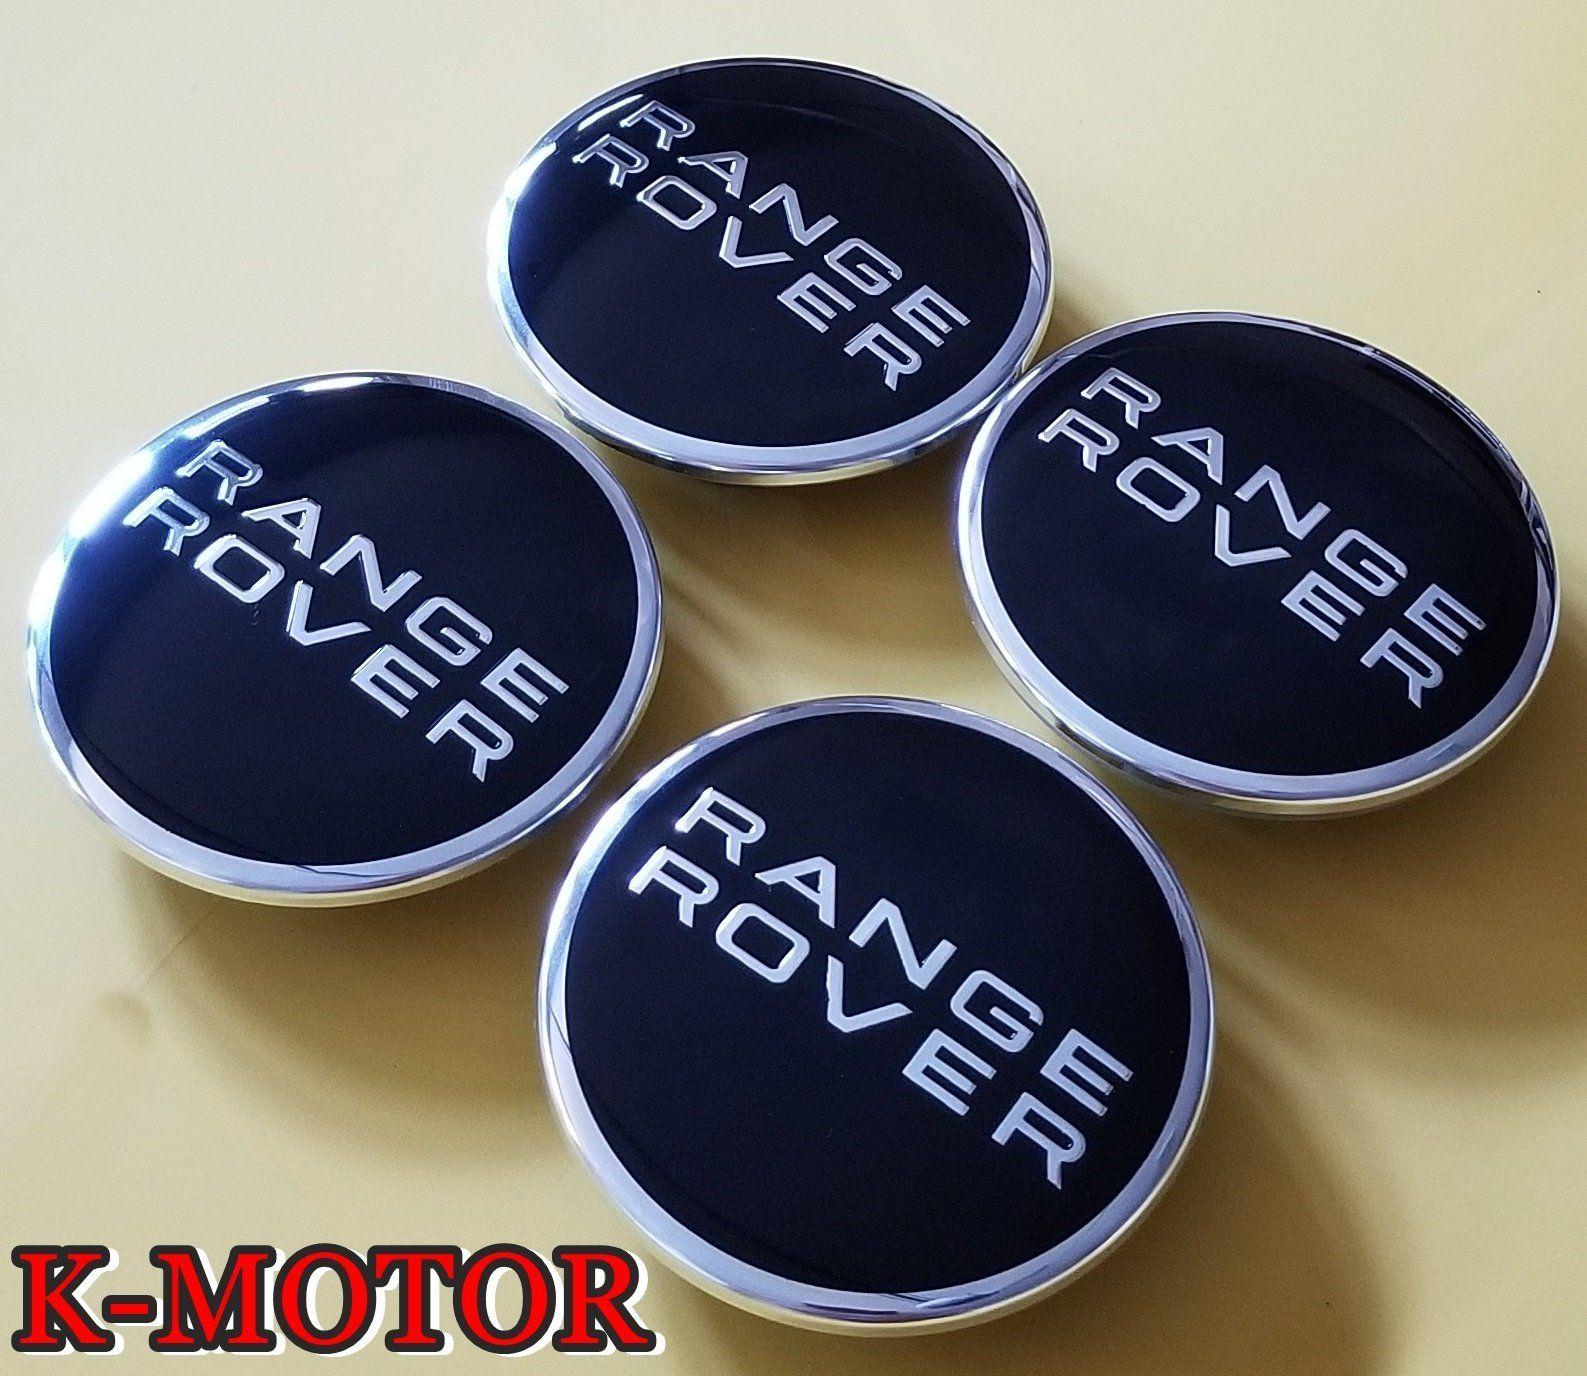 4 Pcs Range Rover Land Rover Wheel Center Hub Cap Rim Black Chrome Logo Badge Performance Kmotor Hub Caps Honda Wheels Range Rover